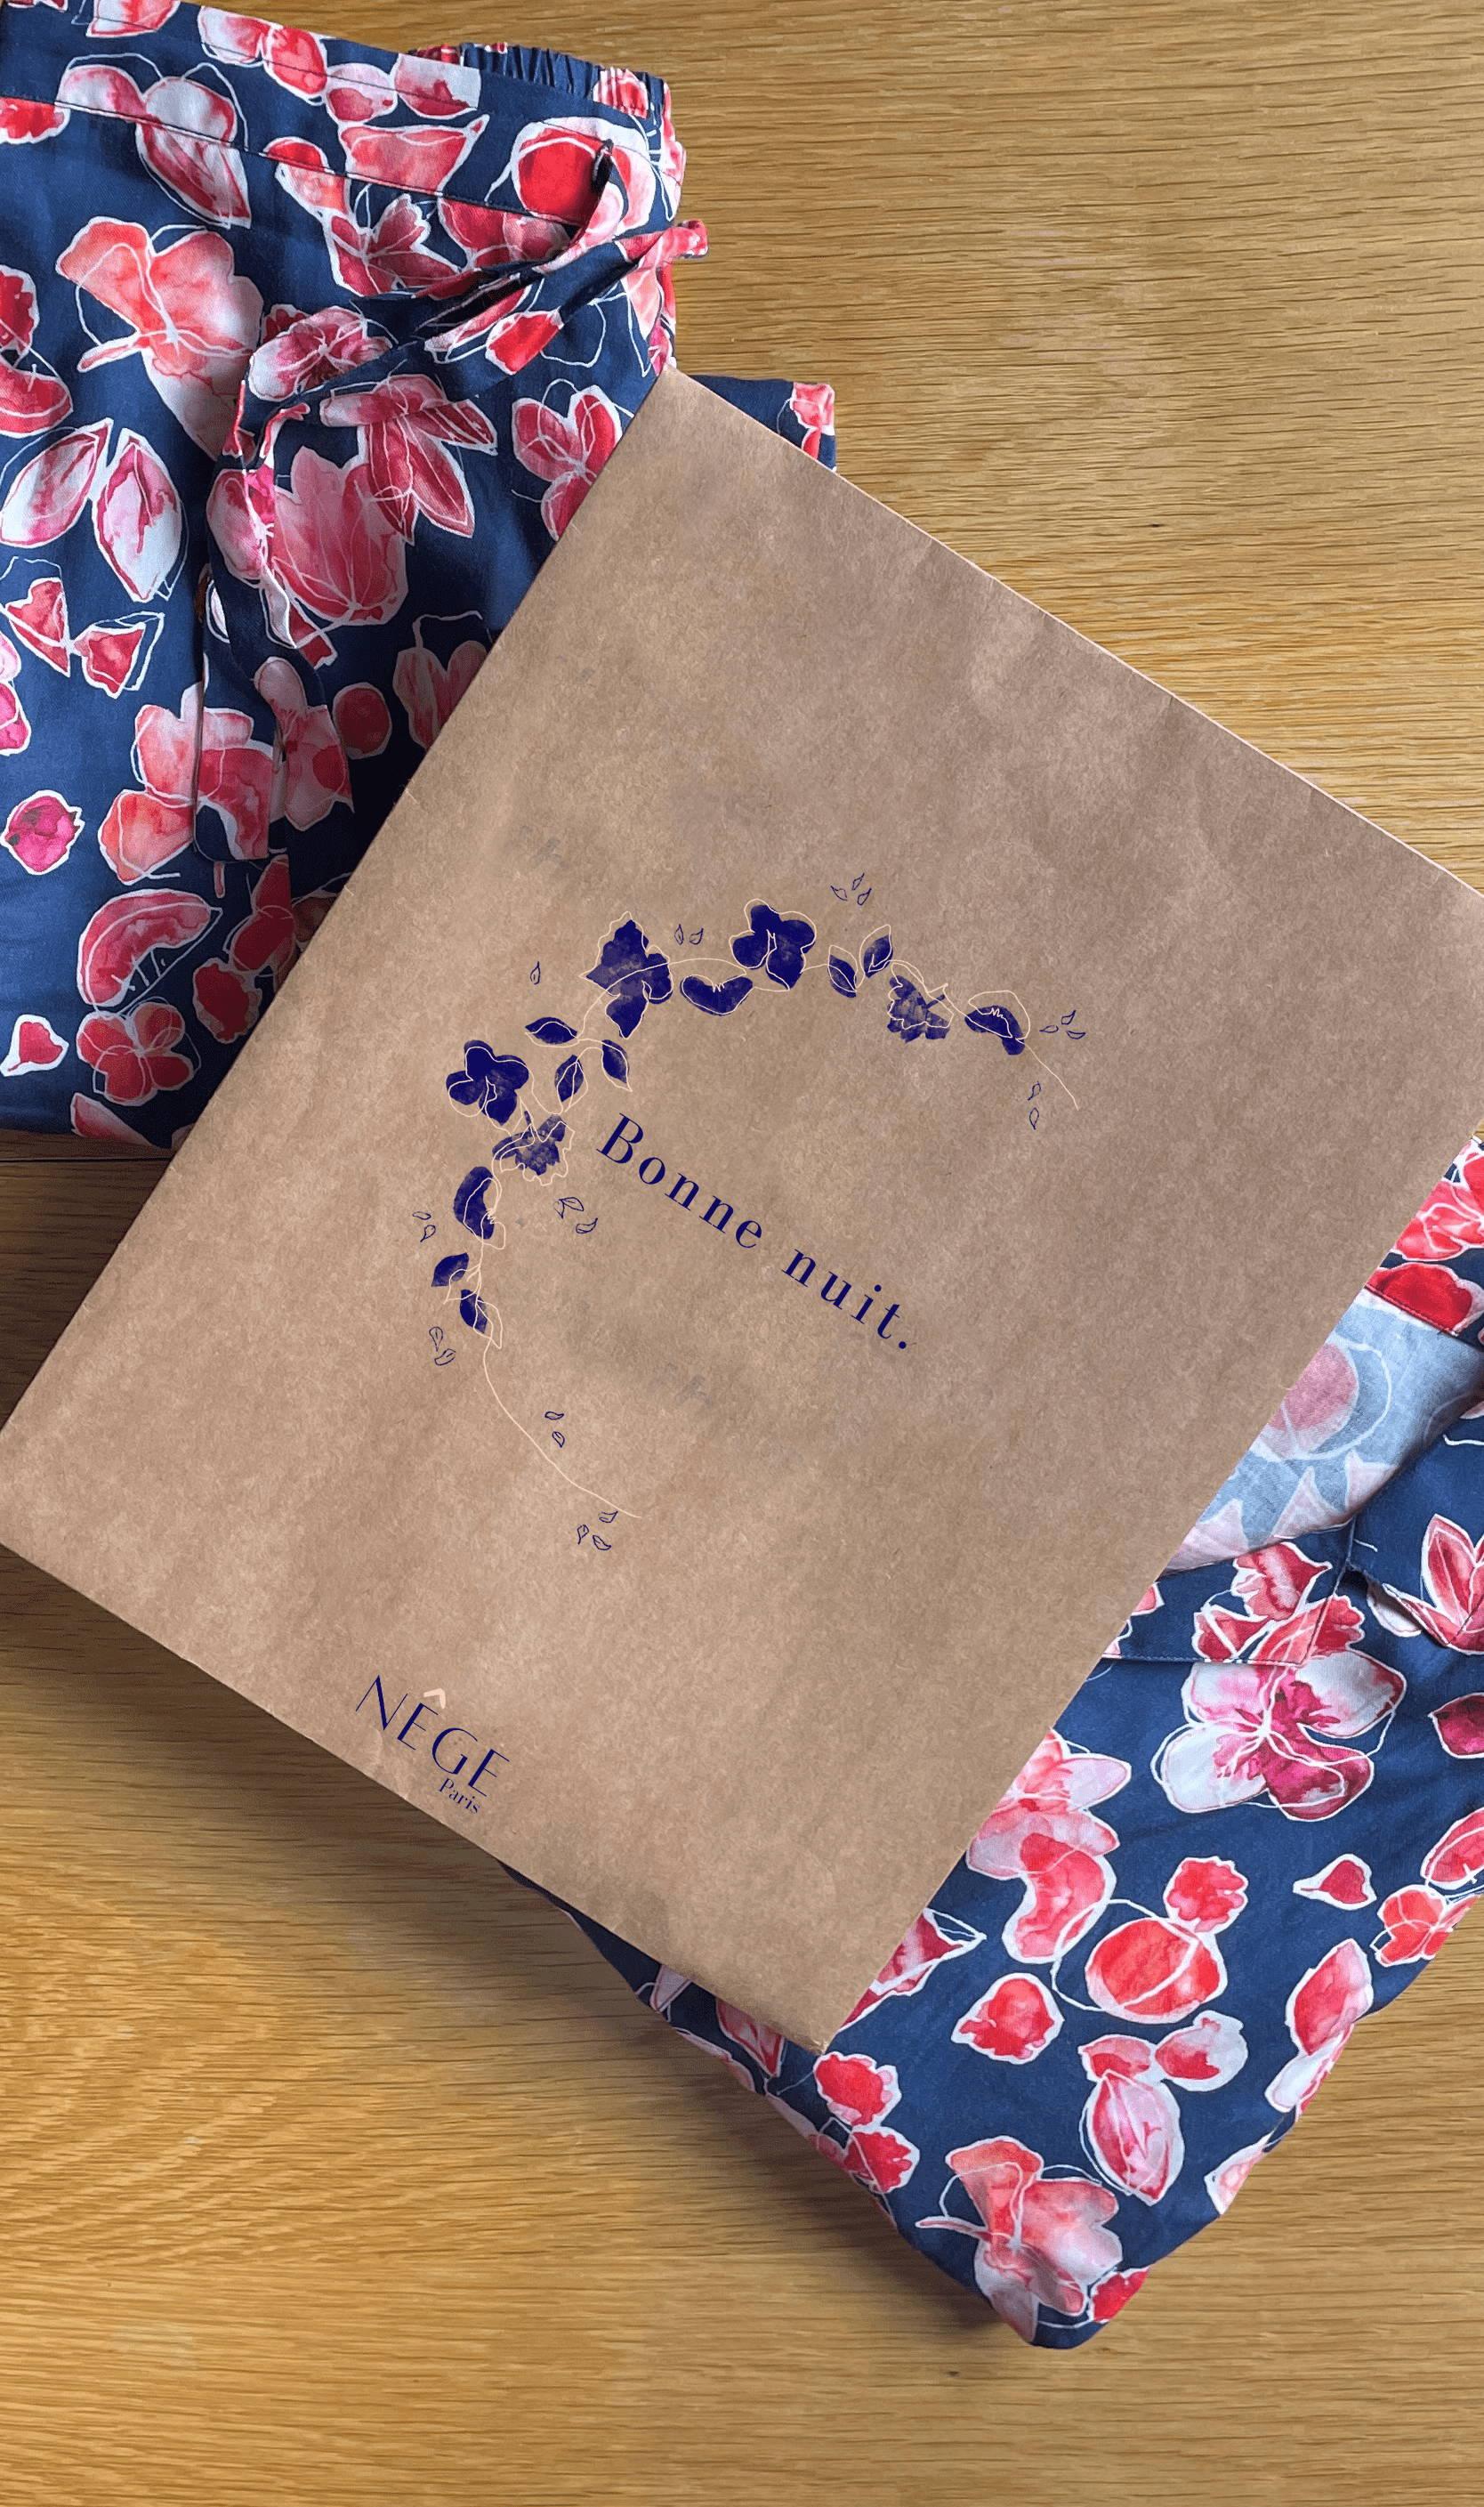 êge Paris - Notre enveloppe minimaliste qui emballe vos pyjamas